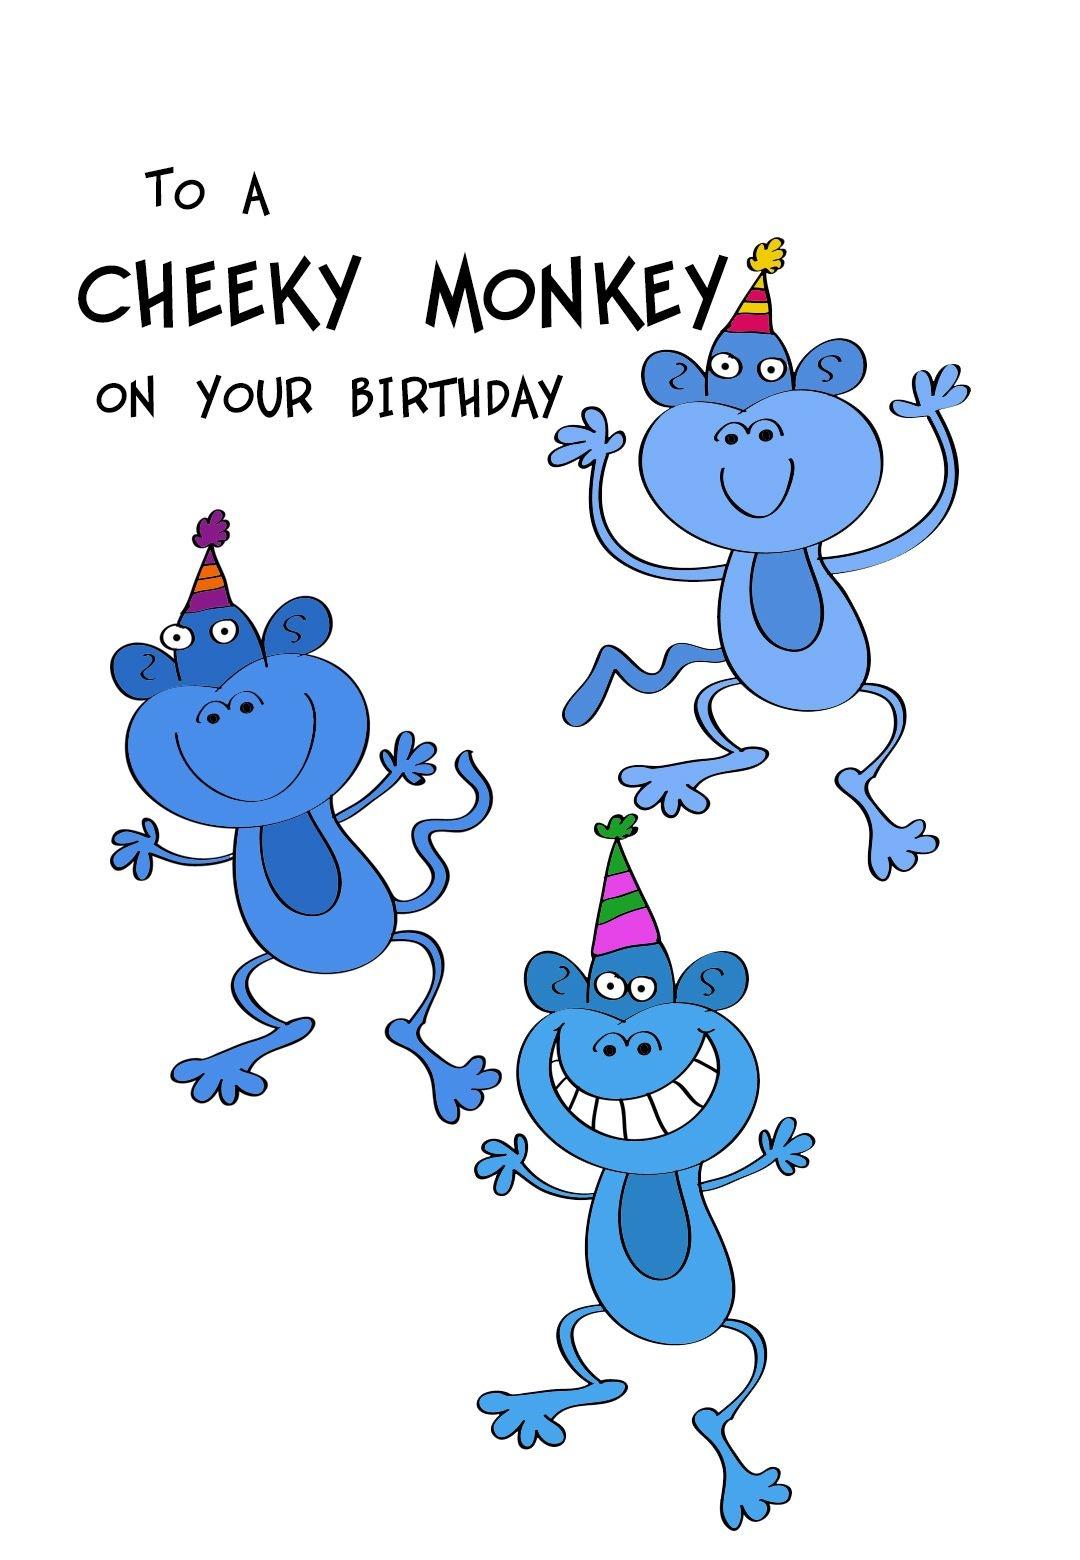 Free Printable To A Cheeky Monkey Greeting Card #birthday - Customized Birthday Cards Free Printable